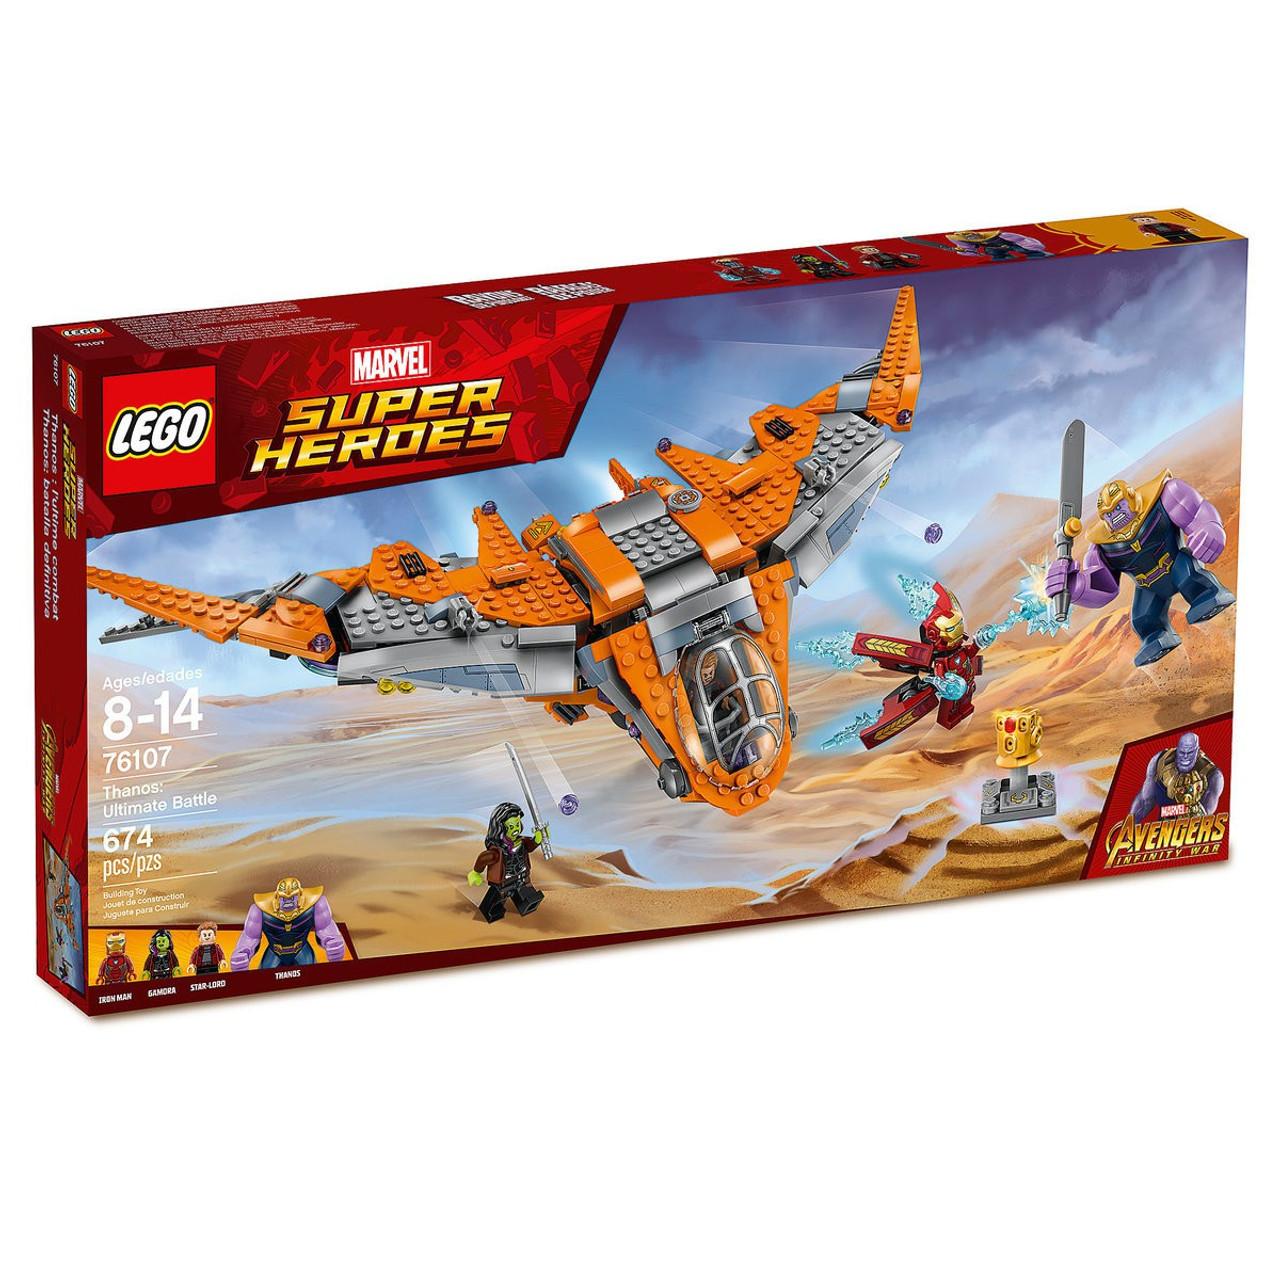 Lego Marvel Super Heroes Avengers Infinity War Thanos